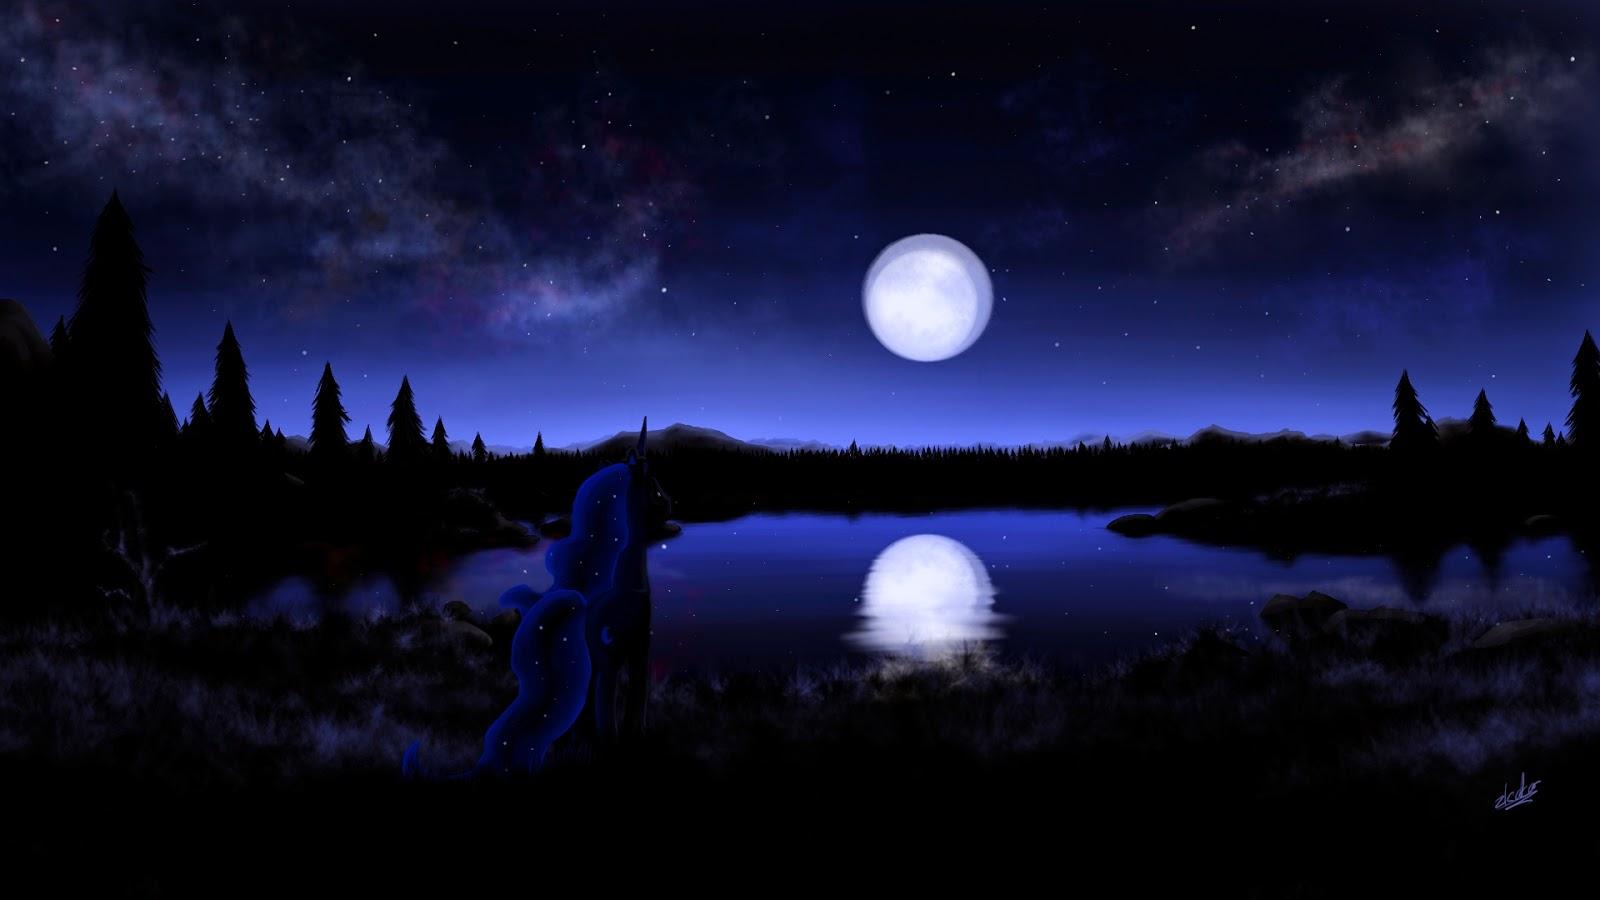 Dark-theme-night-art-beauty-of-night-moon-HD-image.jpg